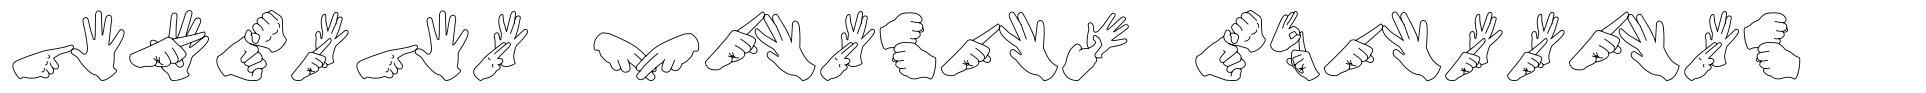 Auslan Finger Spelling font